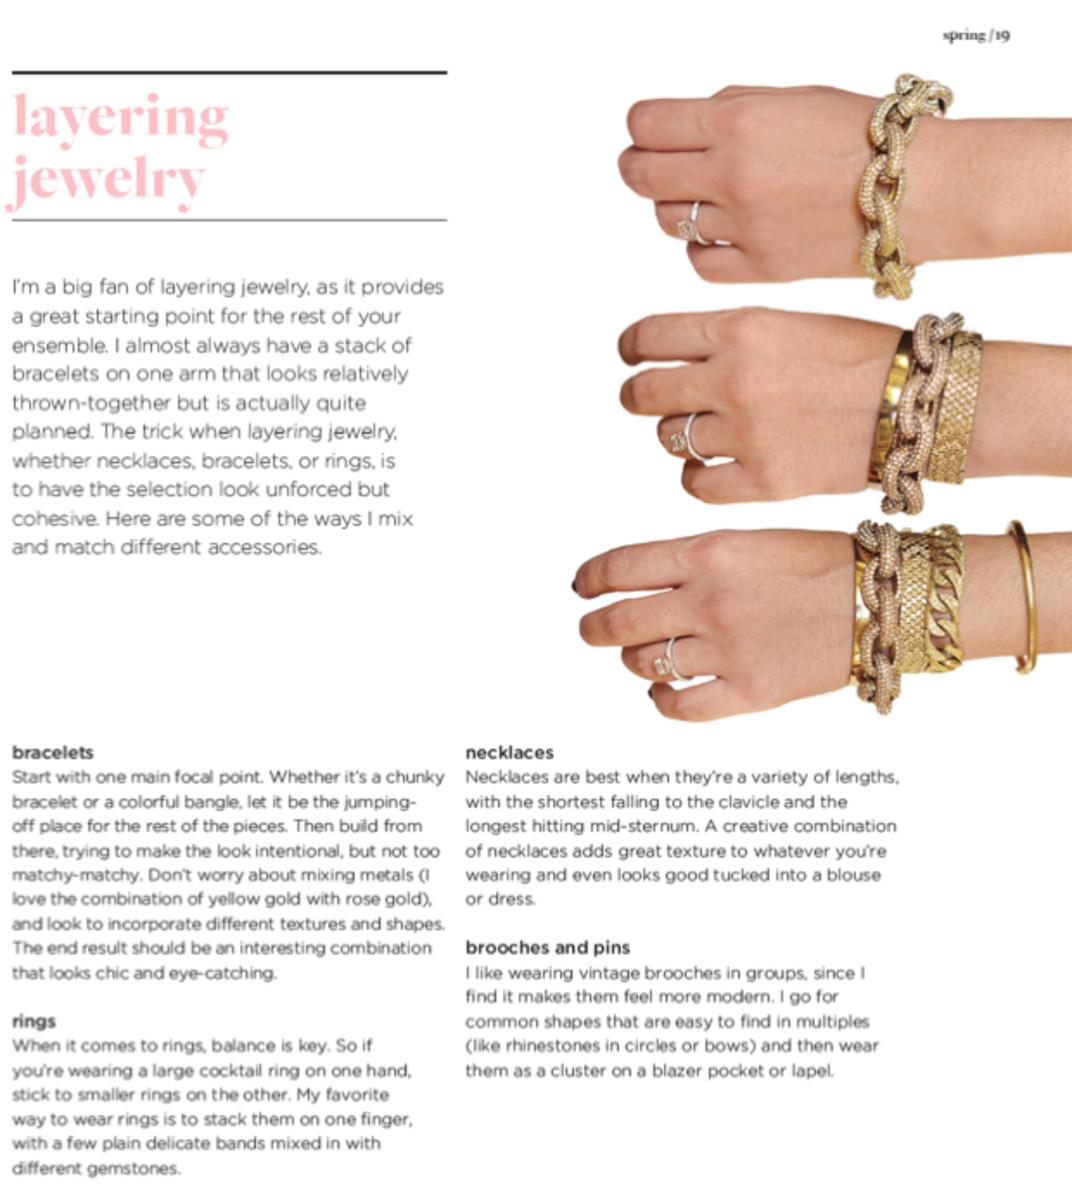 layering-jewelry